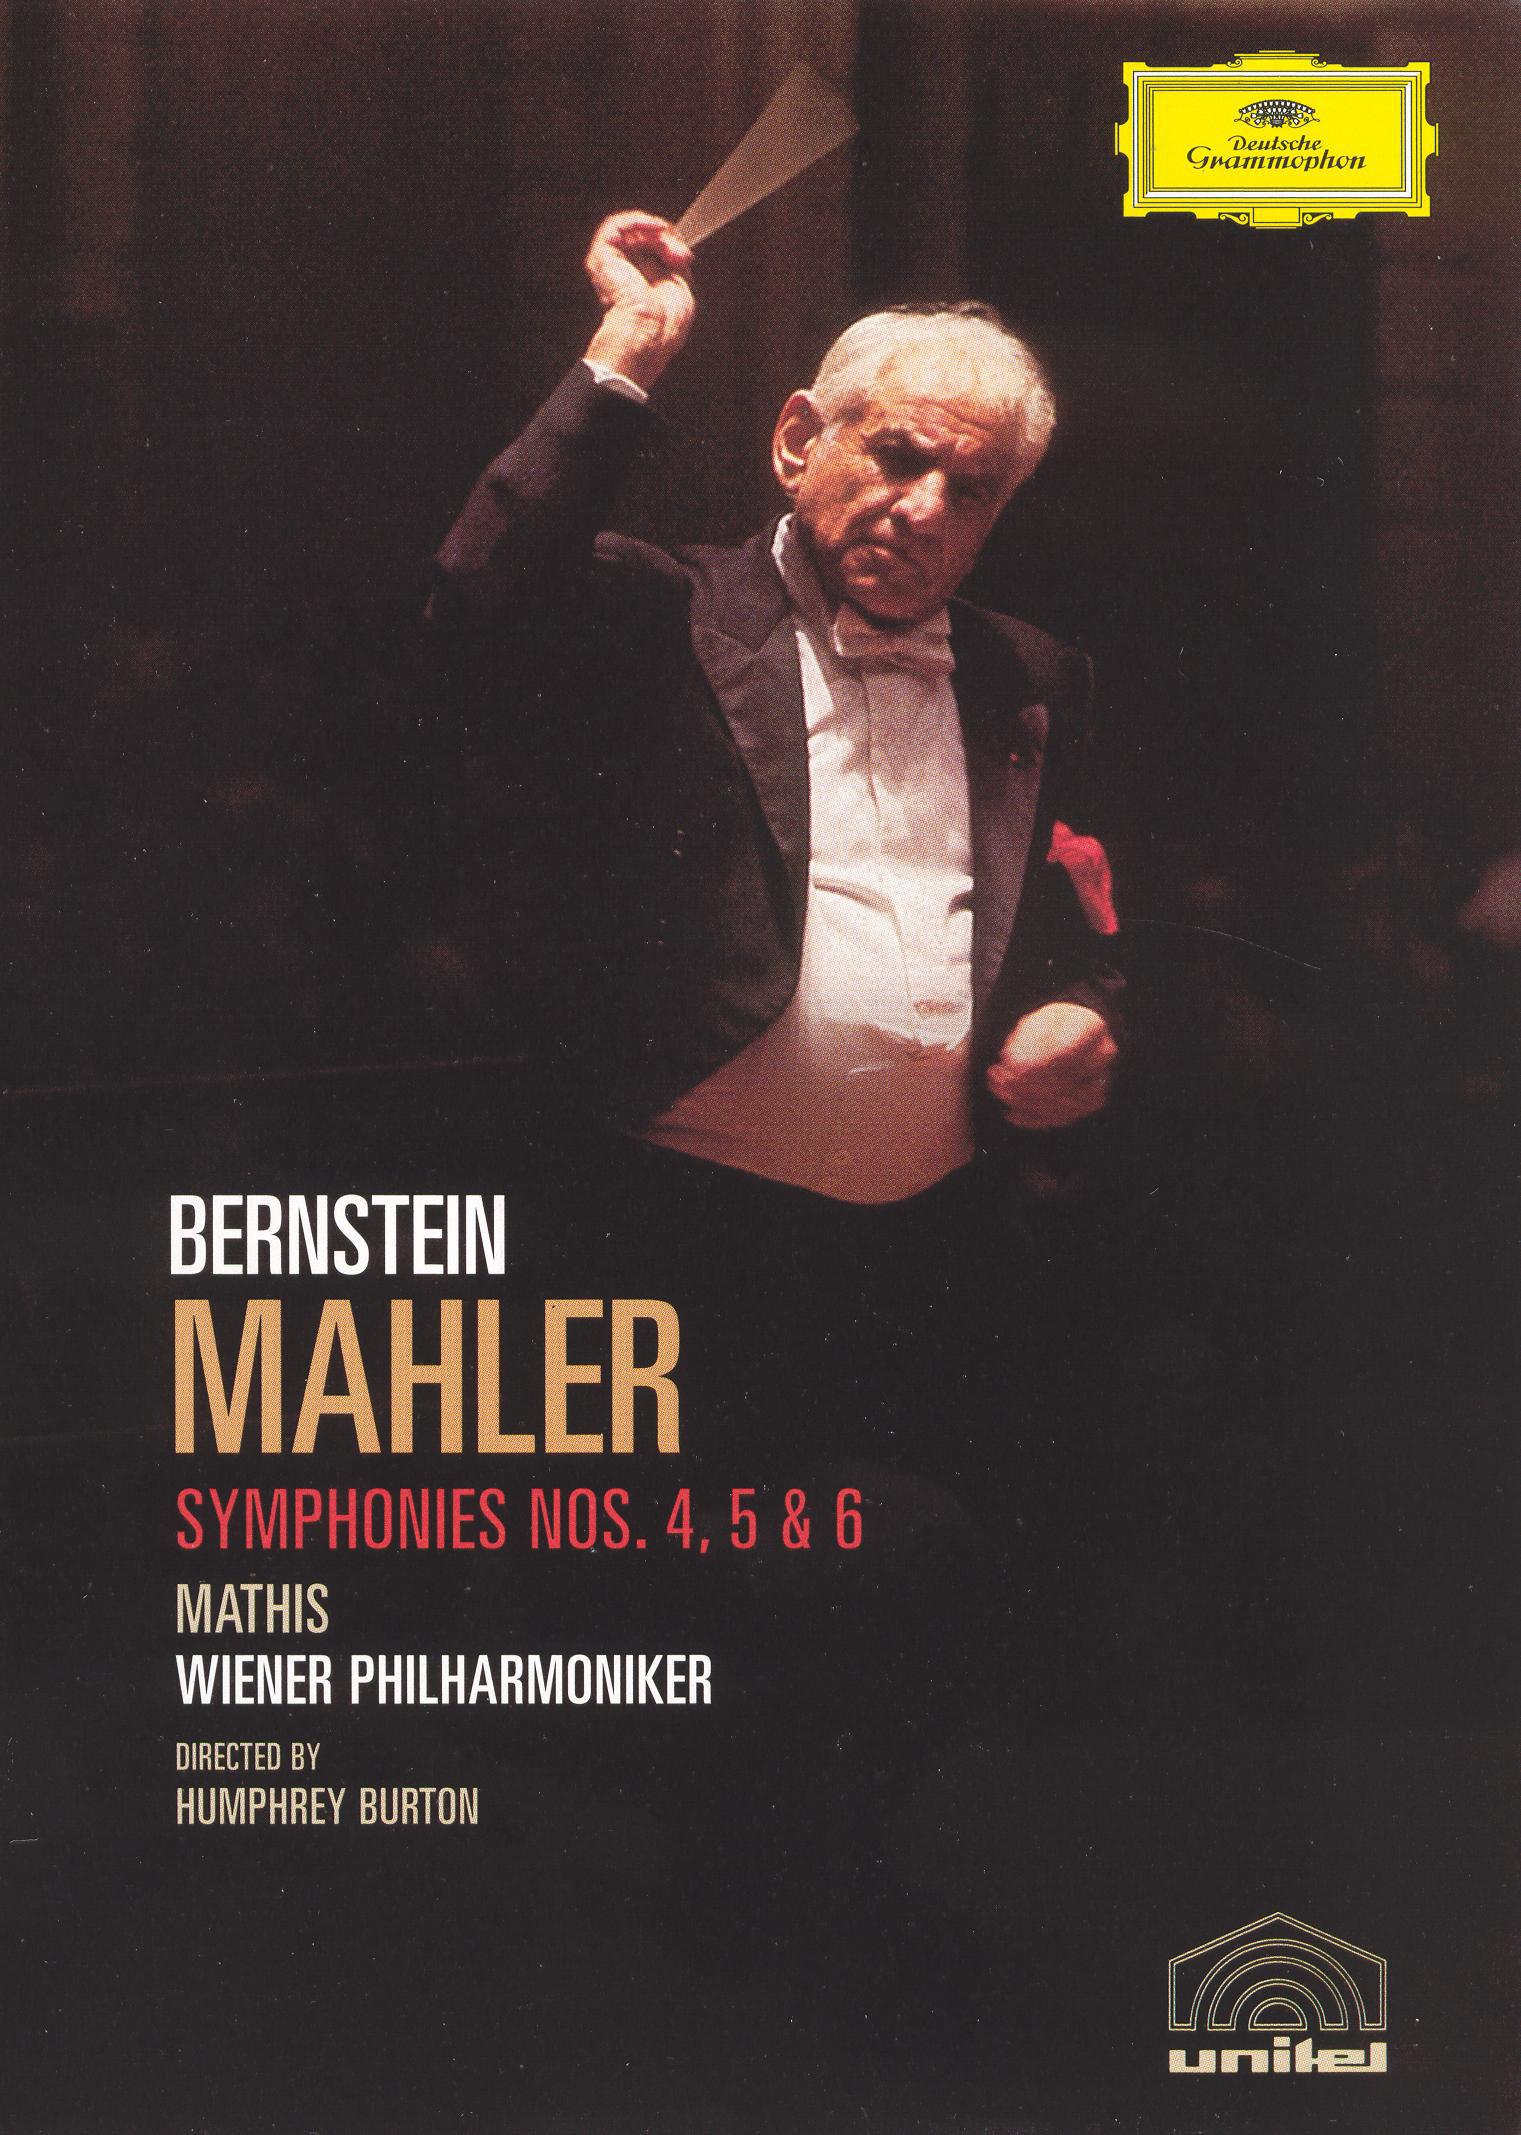 Bernstein: Mahler - Symphonies 4, 5 & 6